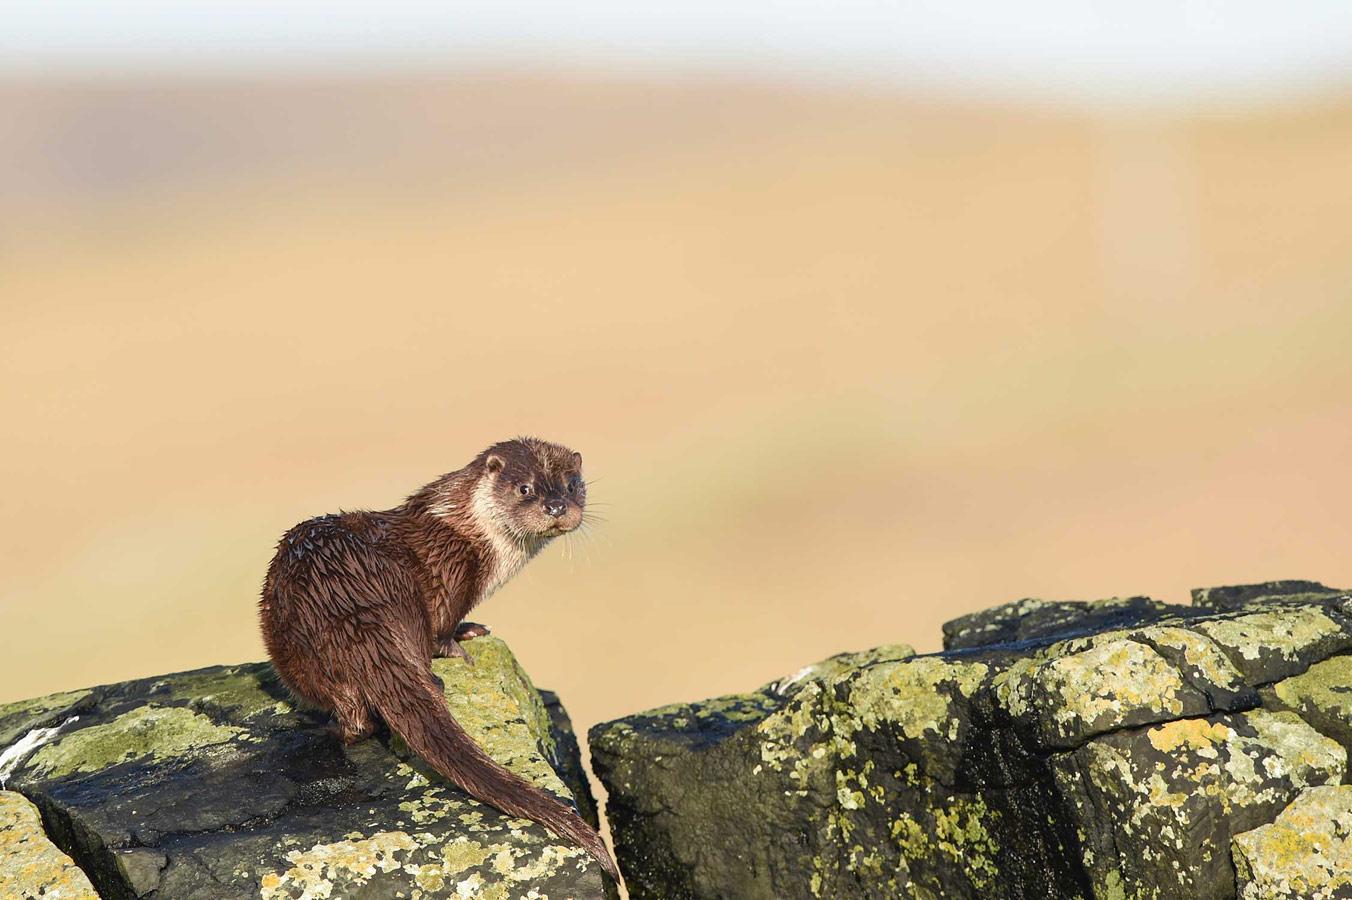 На вершине скалы. Шетланд, © Кейси Хантер Томасон, Конкурс фотографий дикой природы British Wildlife